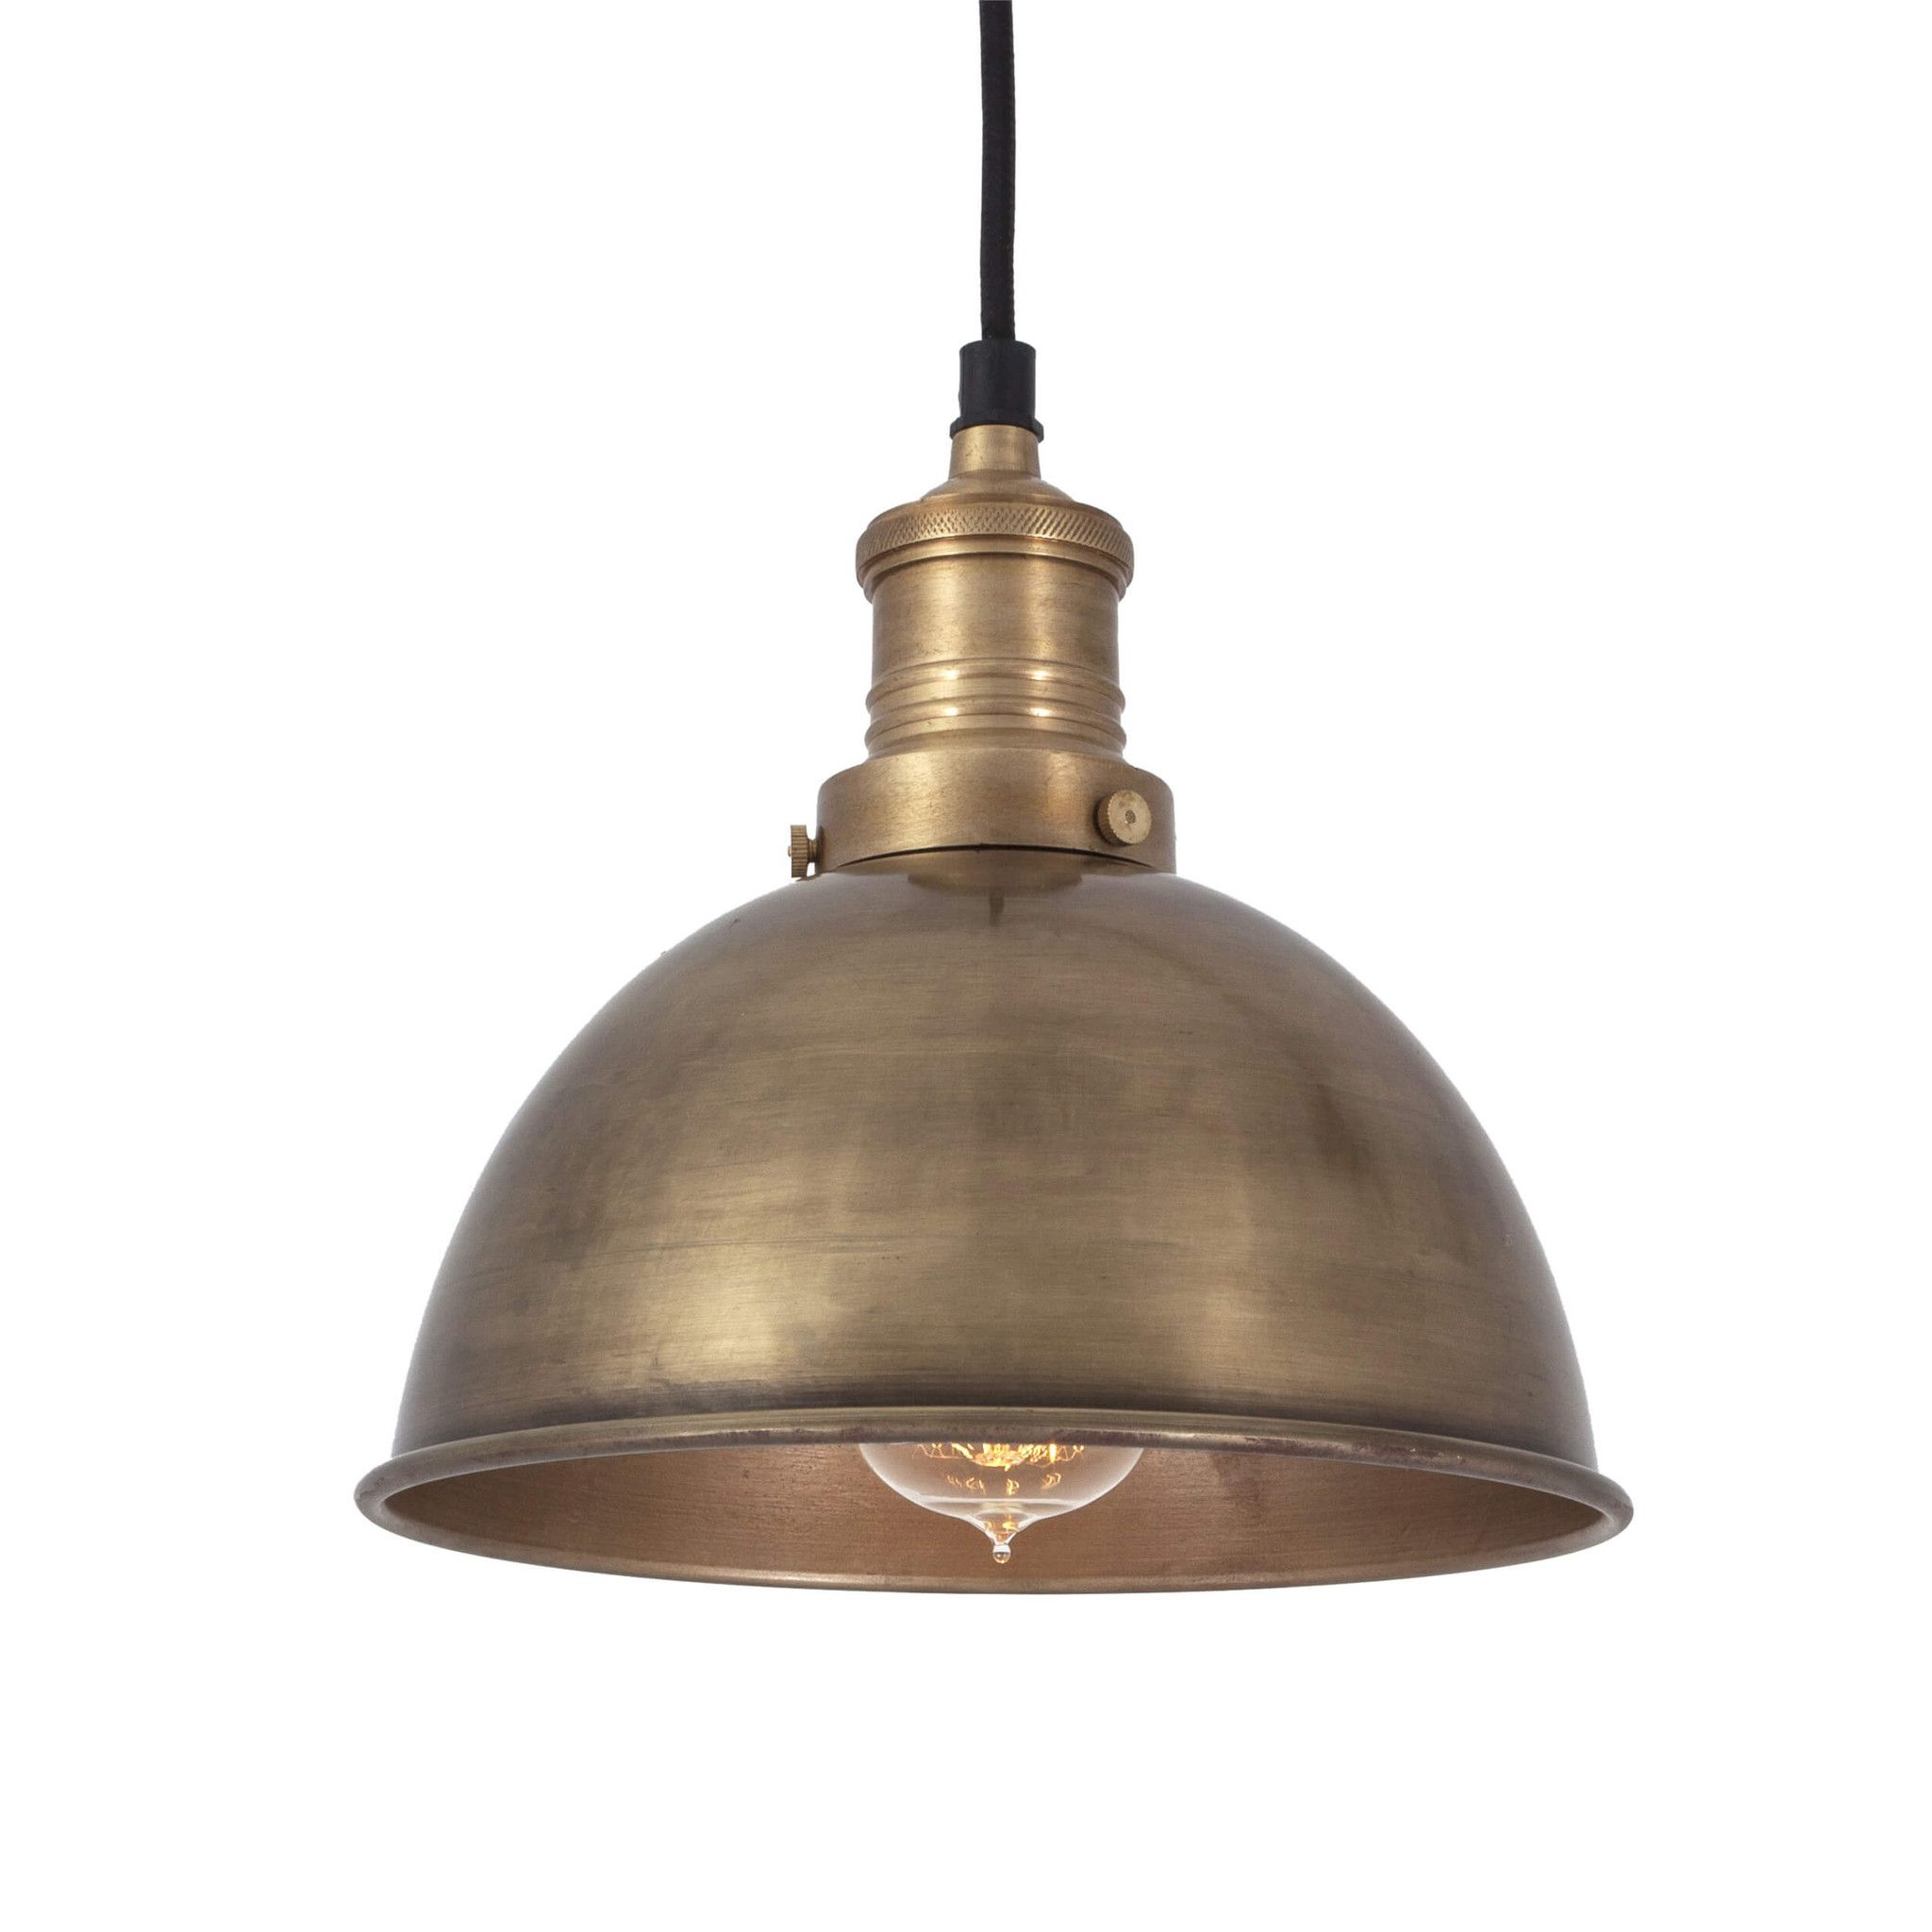 Brooklyn Vintage Small Metal Dome Pendant Light